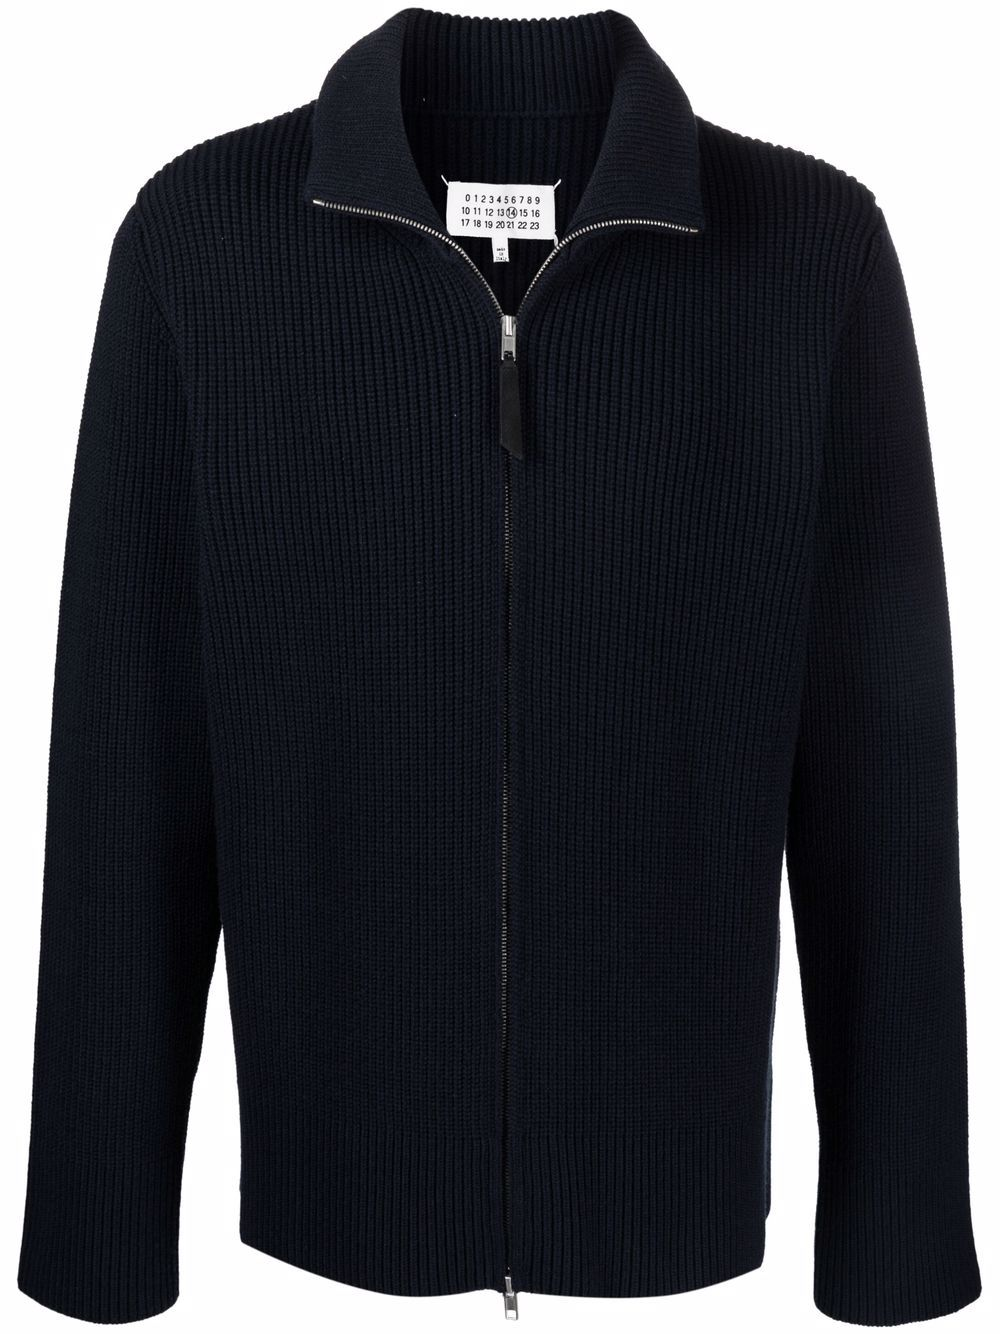 sweater with zip man navy MAISON MARGIELA | Sweaters | S50GP0246 S17791511F